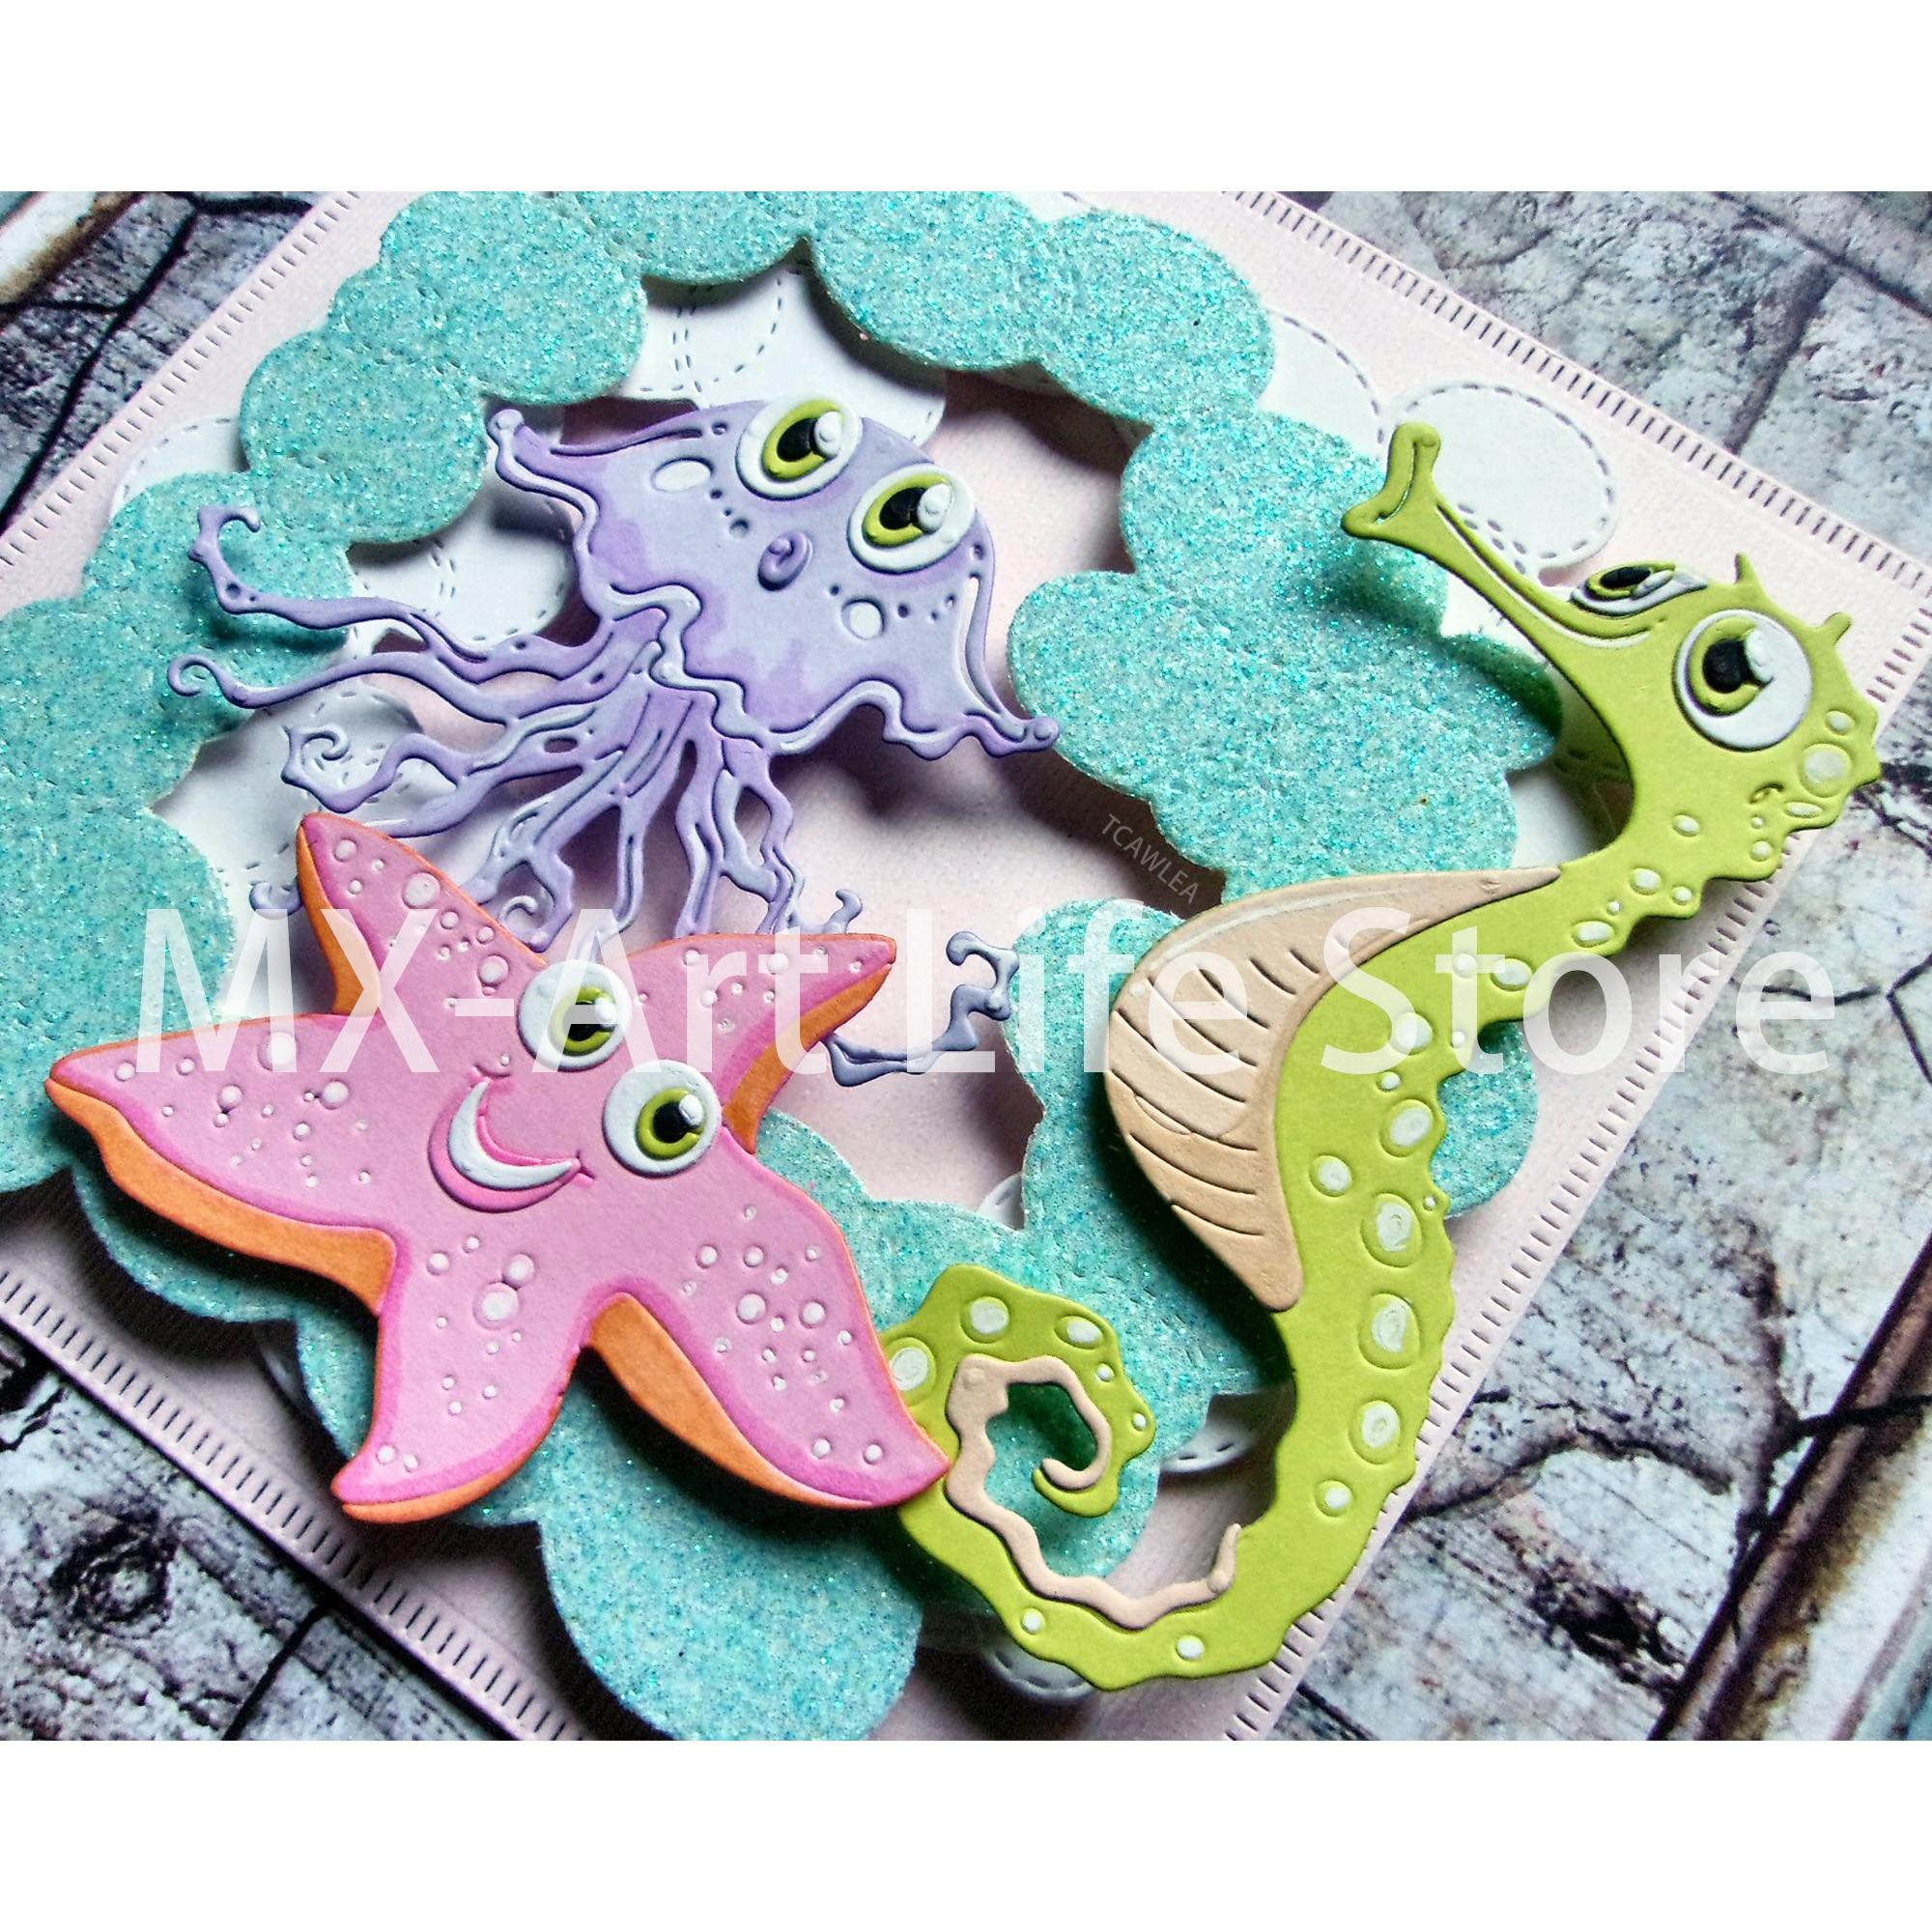 2020 Fish Starfish Crab Shell Jellyfish Metal Cutting Dies Marine Life Ocean Series Stencil For DIY Scrapbooking Decorative